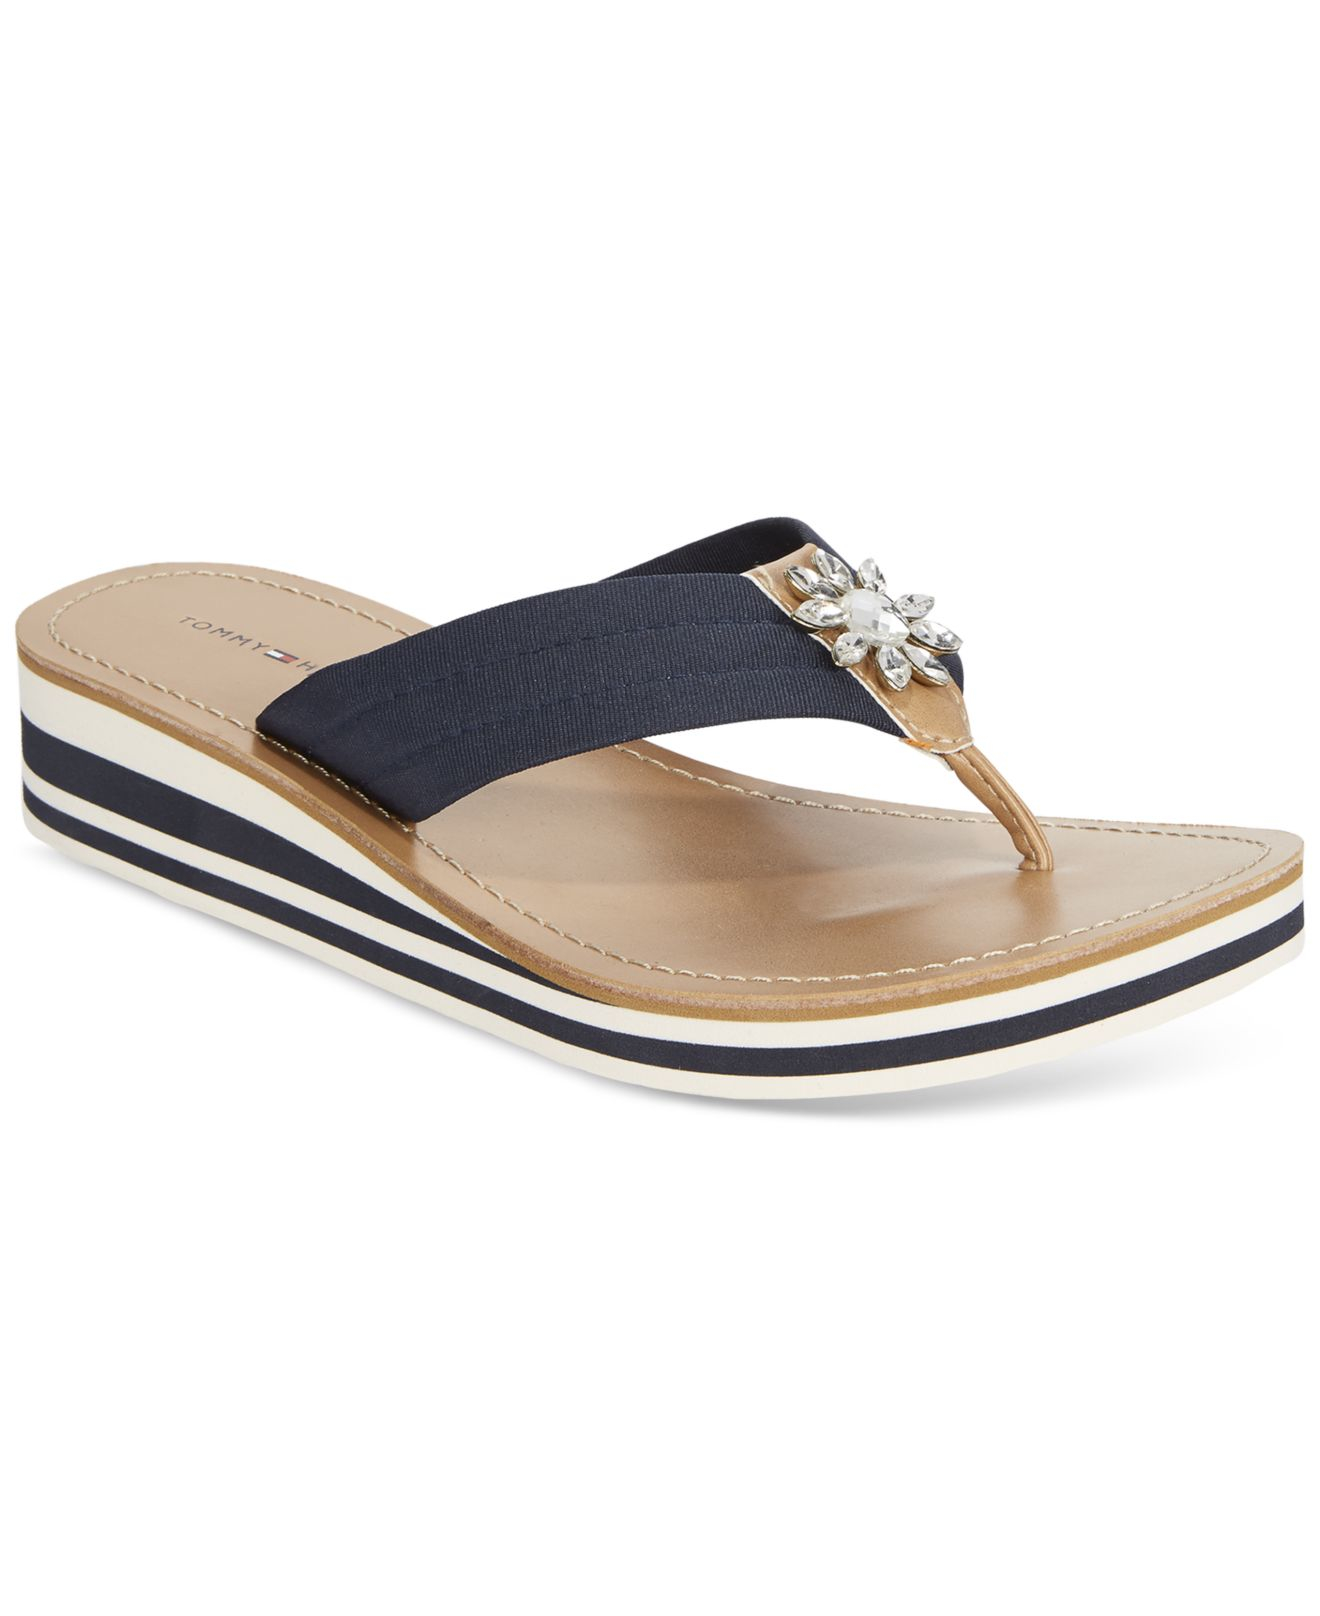 71caa71e9b4 Lyst - Tommy Hilfiger Rayce Wedge Sandals in Blue